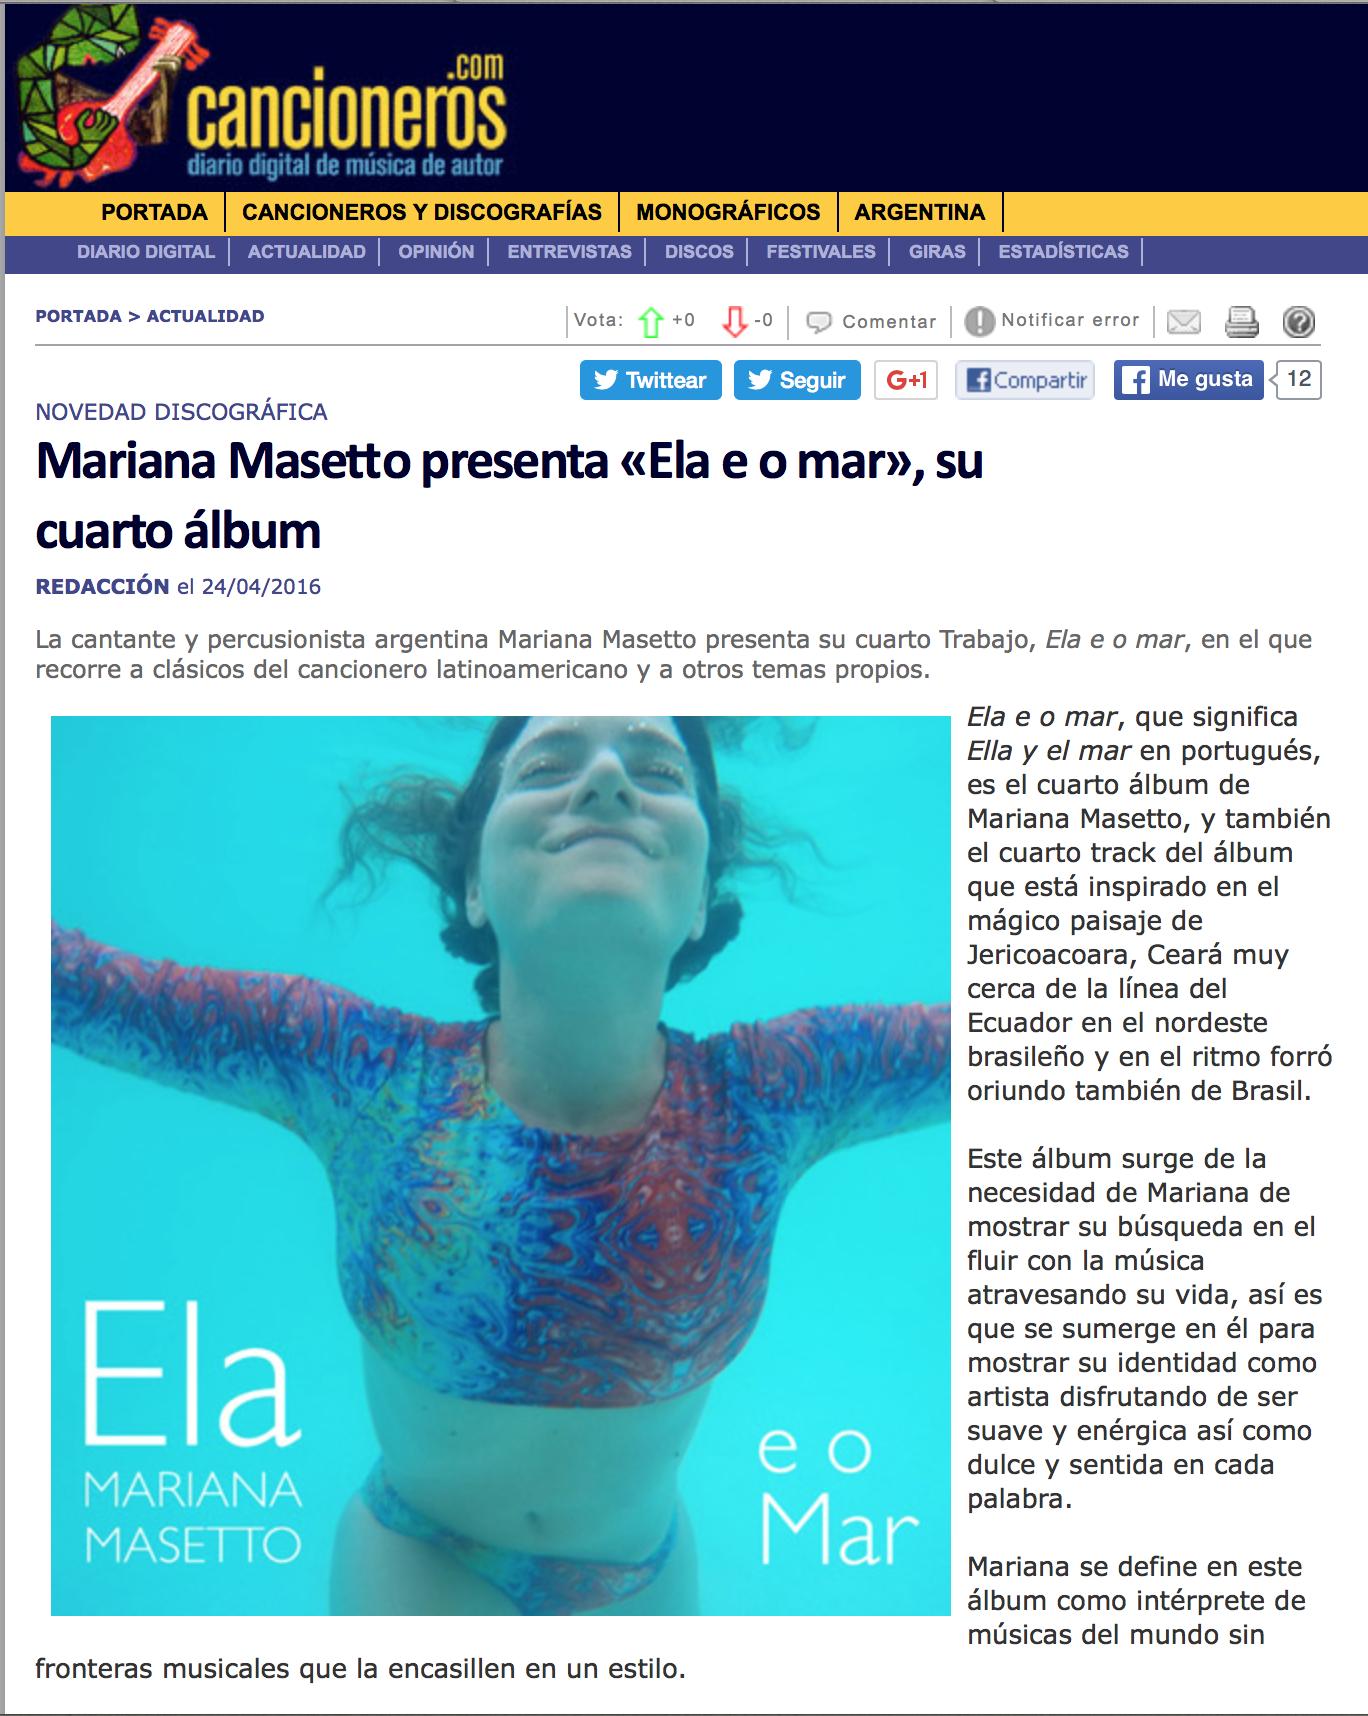 Portal Cancioneros.com, España